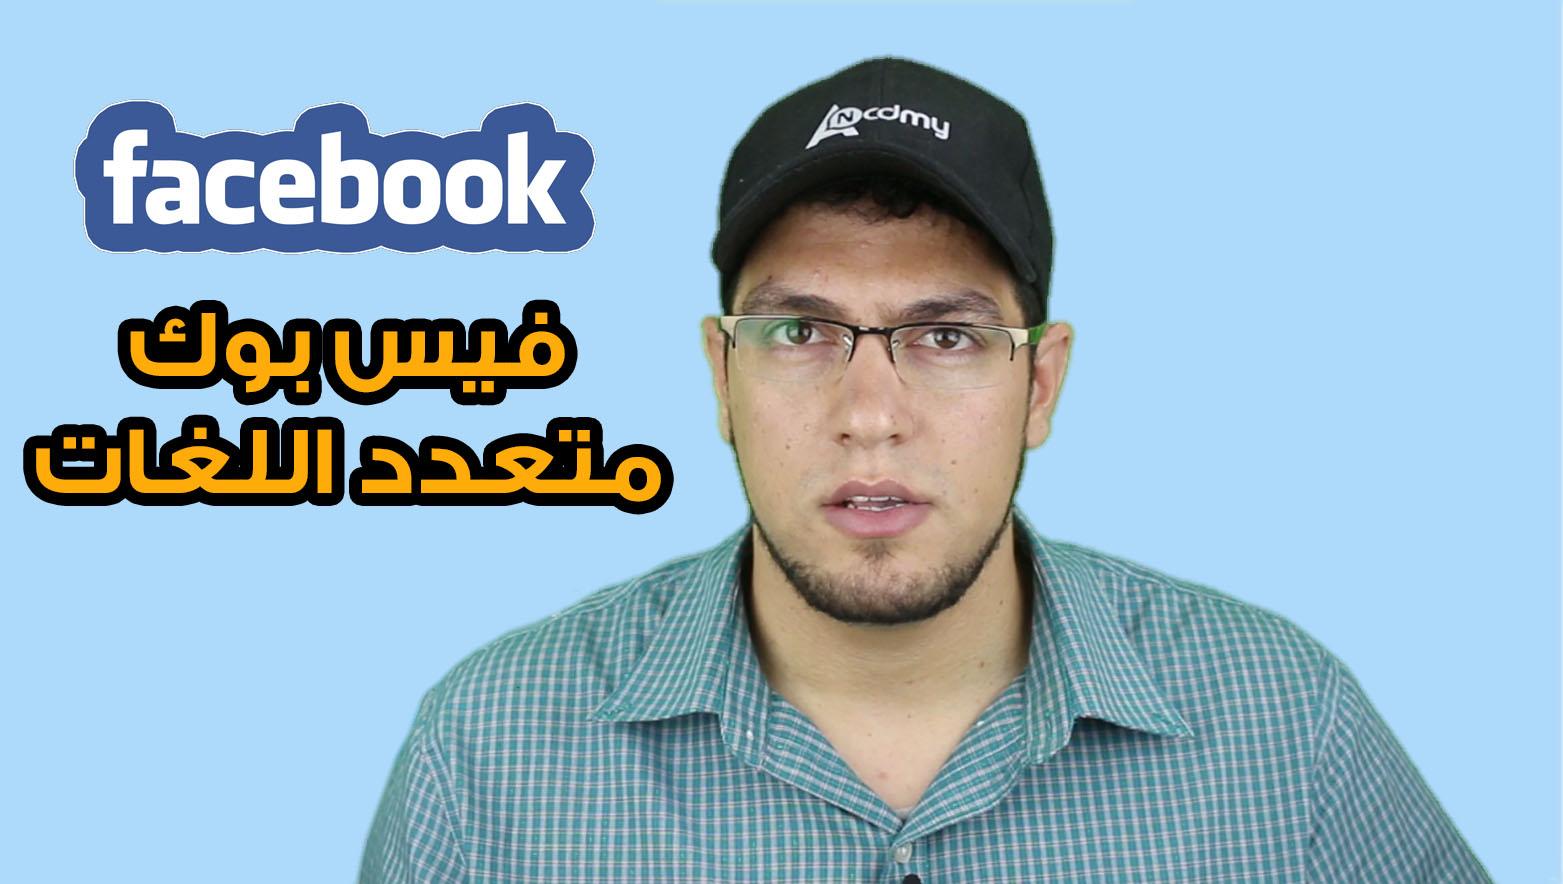 Photo of كيفية الكتابة باكثر من لغة بالفيس بوك